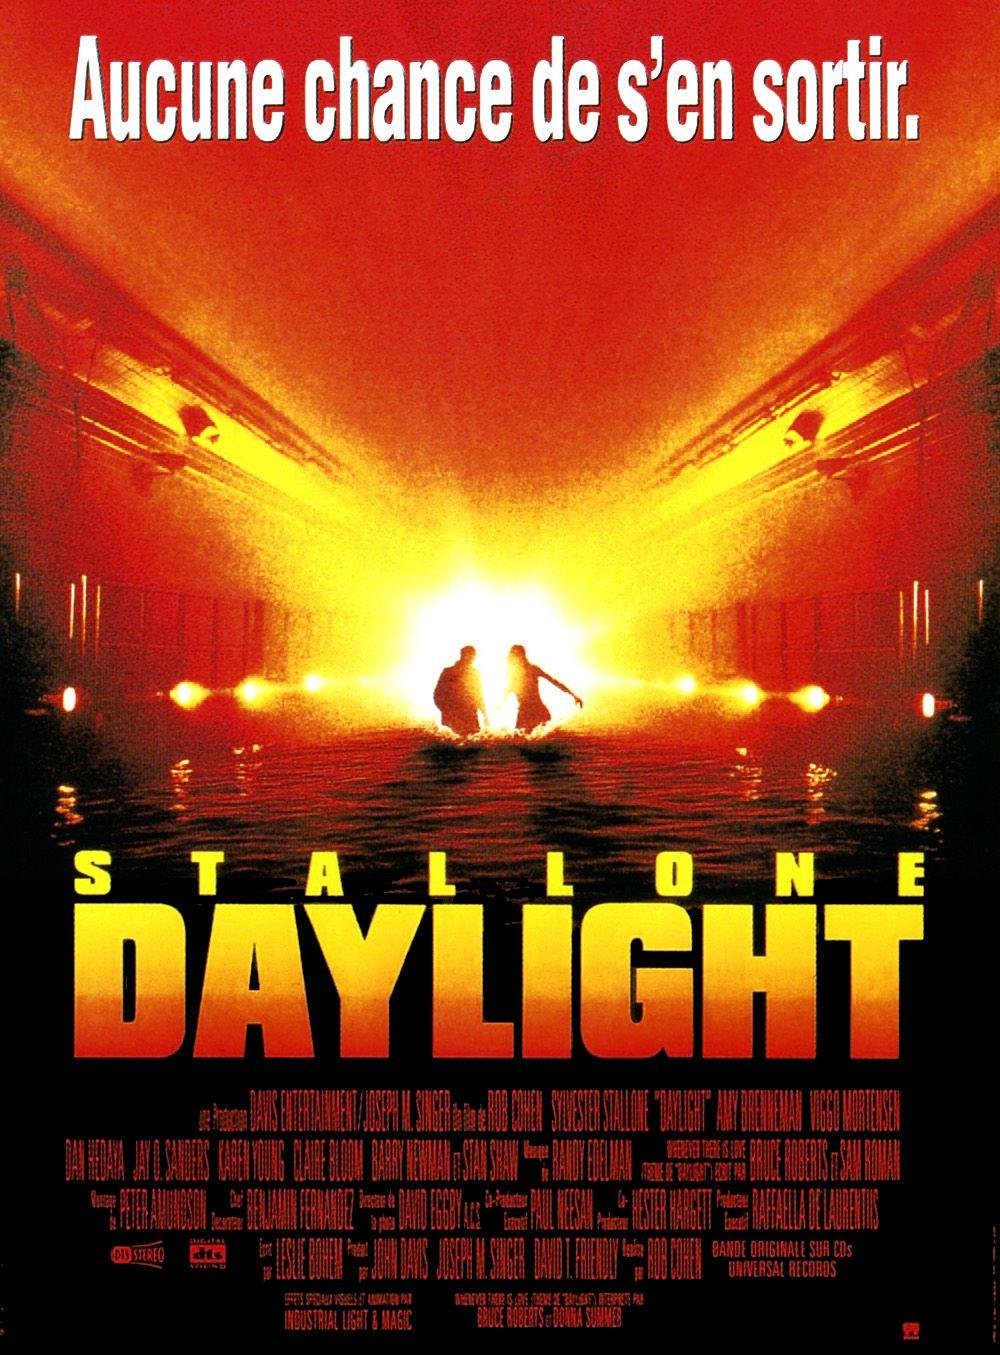 Abécédaire des Films - Page 14 Daylight